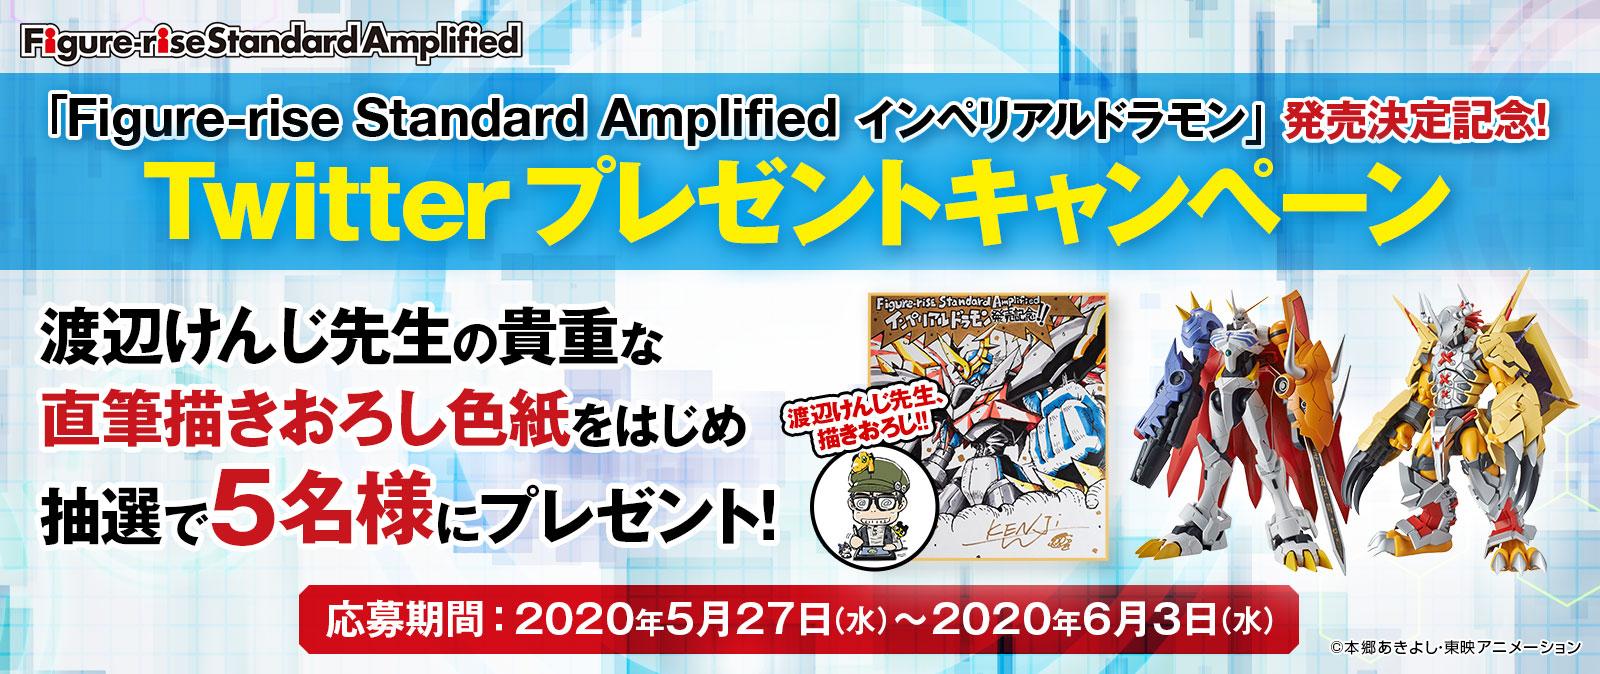 「Figure-rise Standard Amplified インペリアルドラモン」 発売決定記念Twitterプレゼントキャンペーン